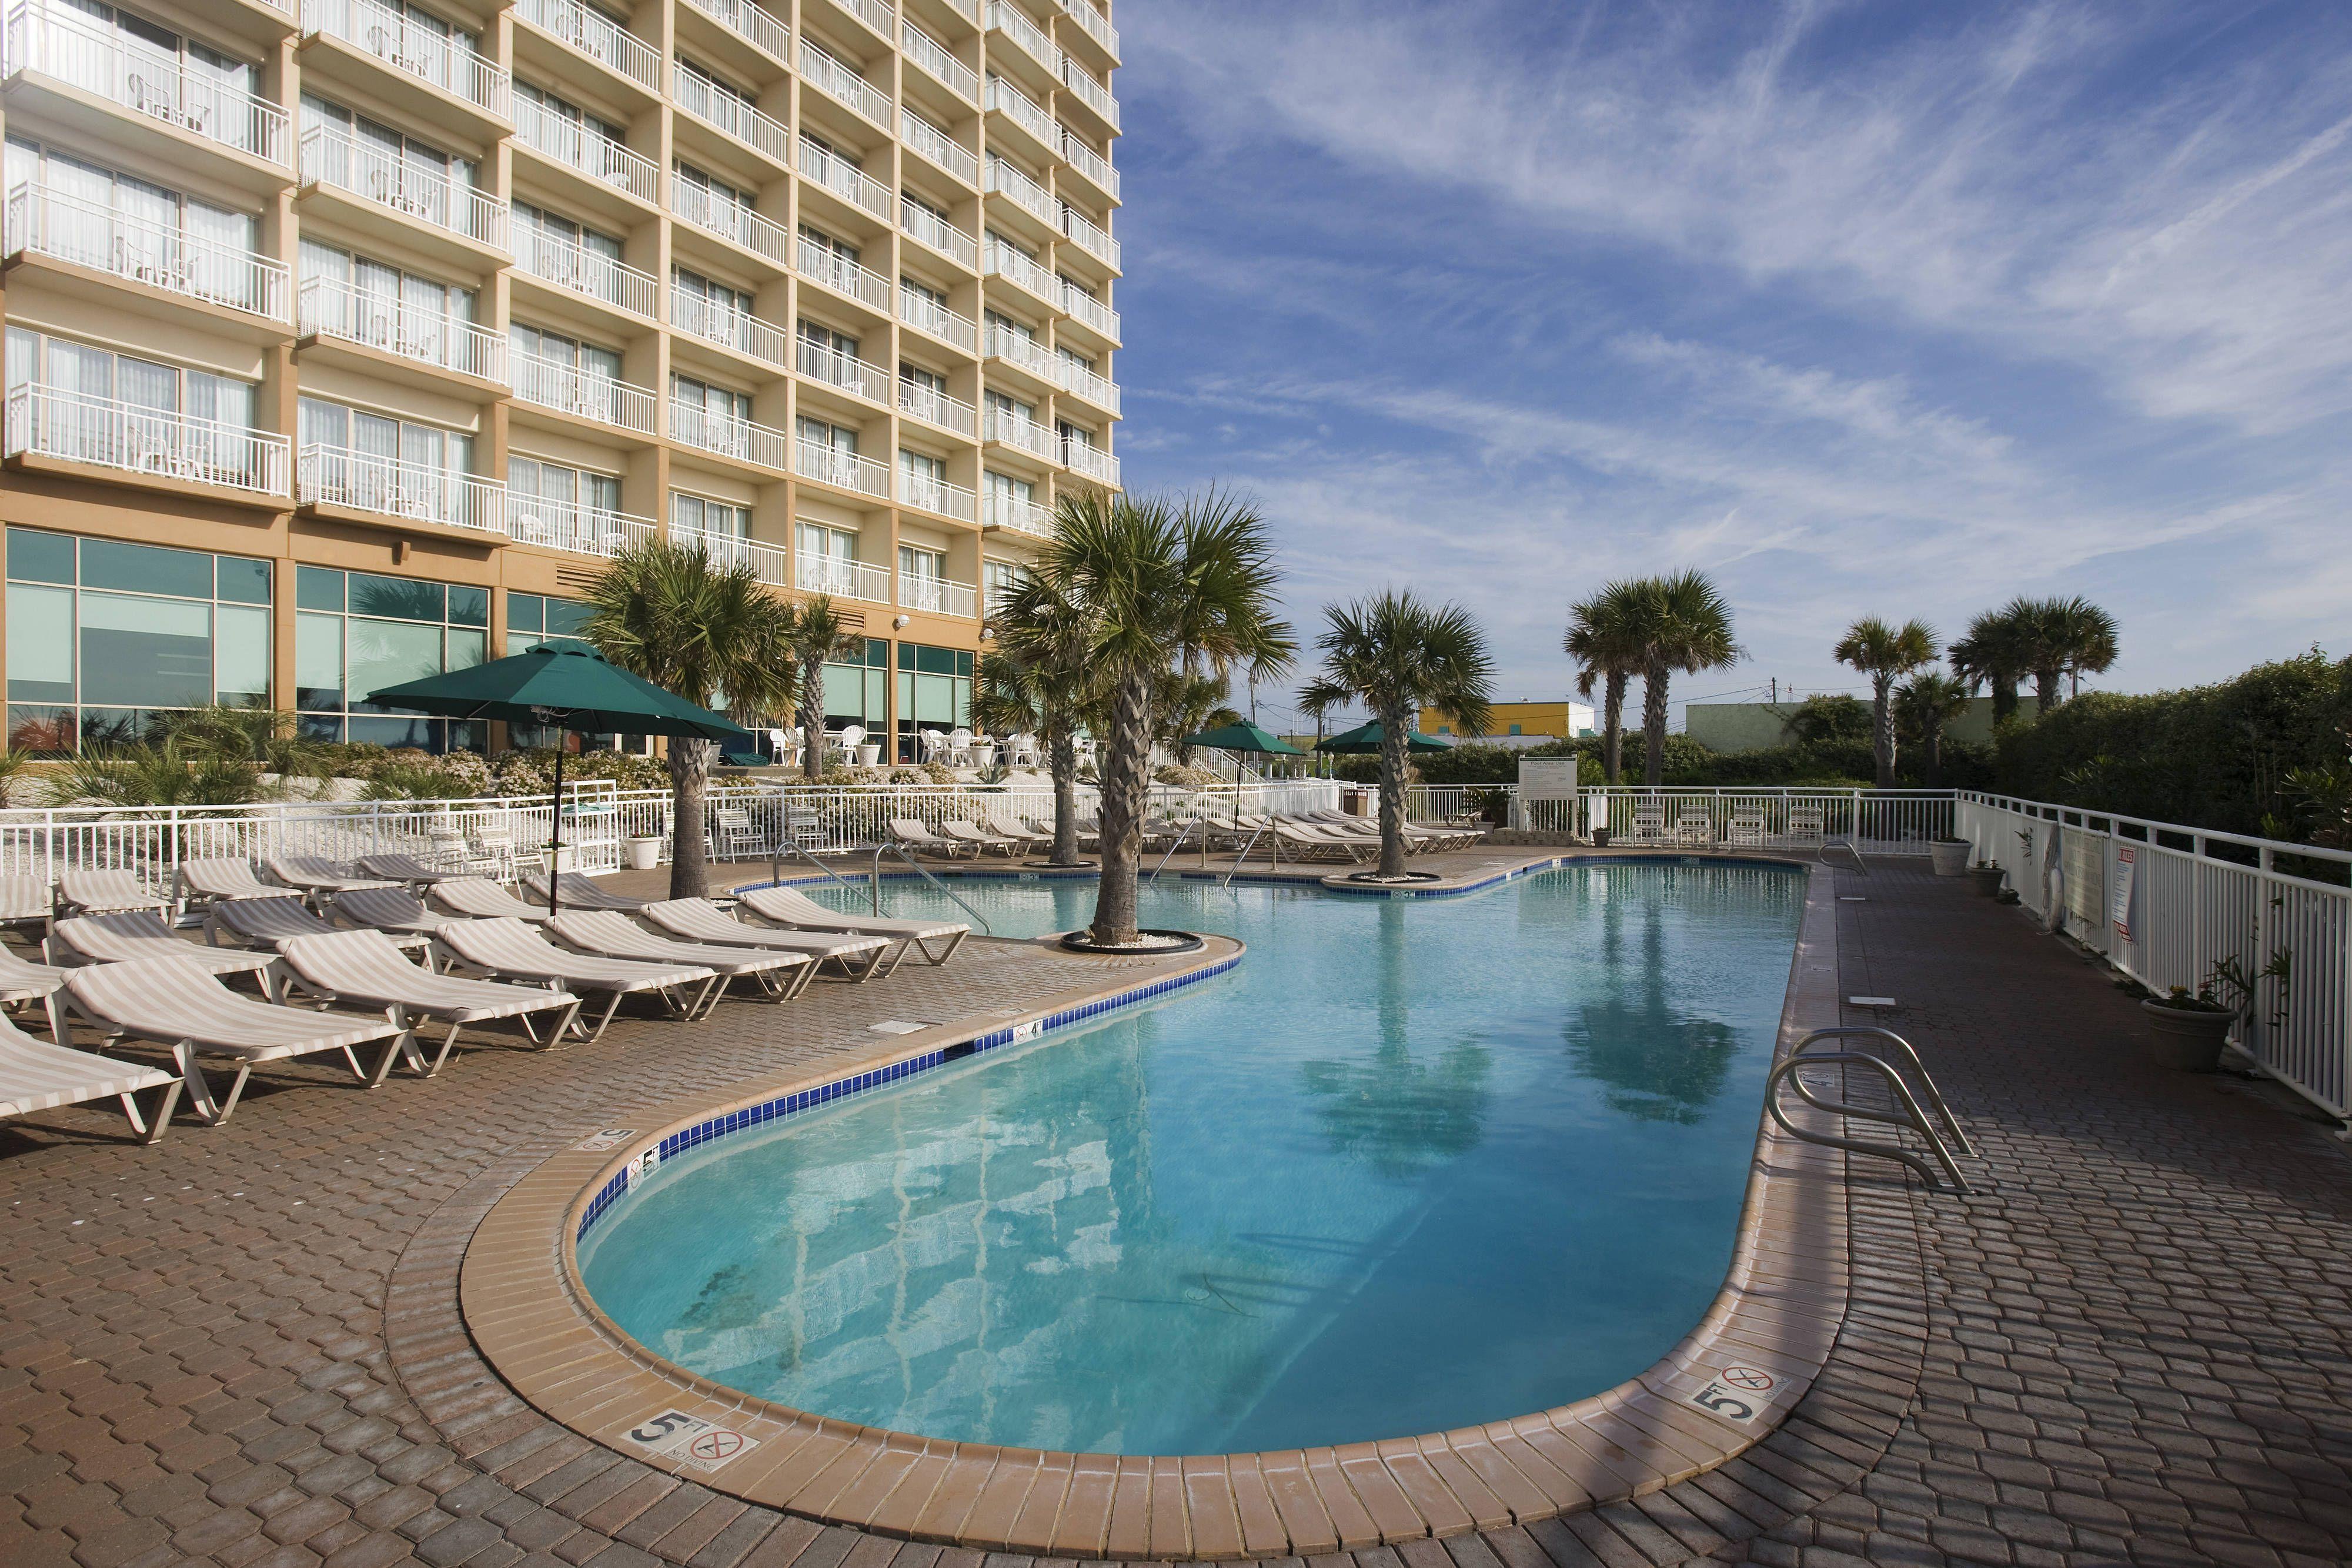 Courtyard Carolina Beach Oceanfront Outdoor Pool Rooms Hotel Enjoy Carolina Beach Hotels Oceanfront Carolina Beach